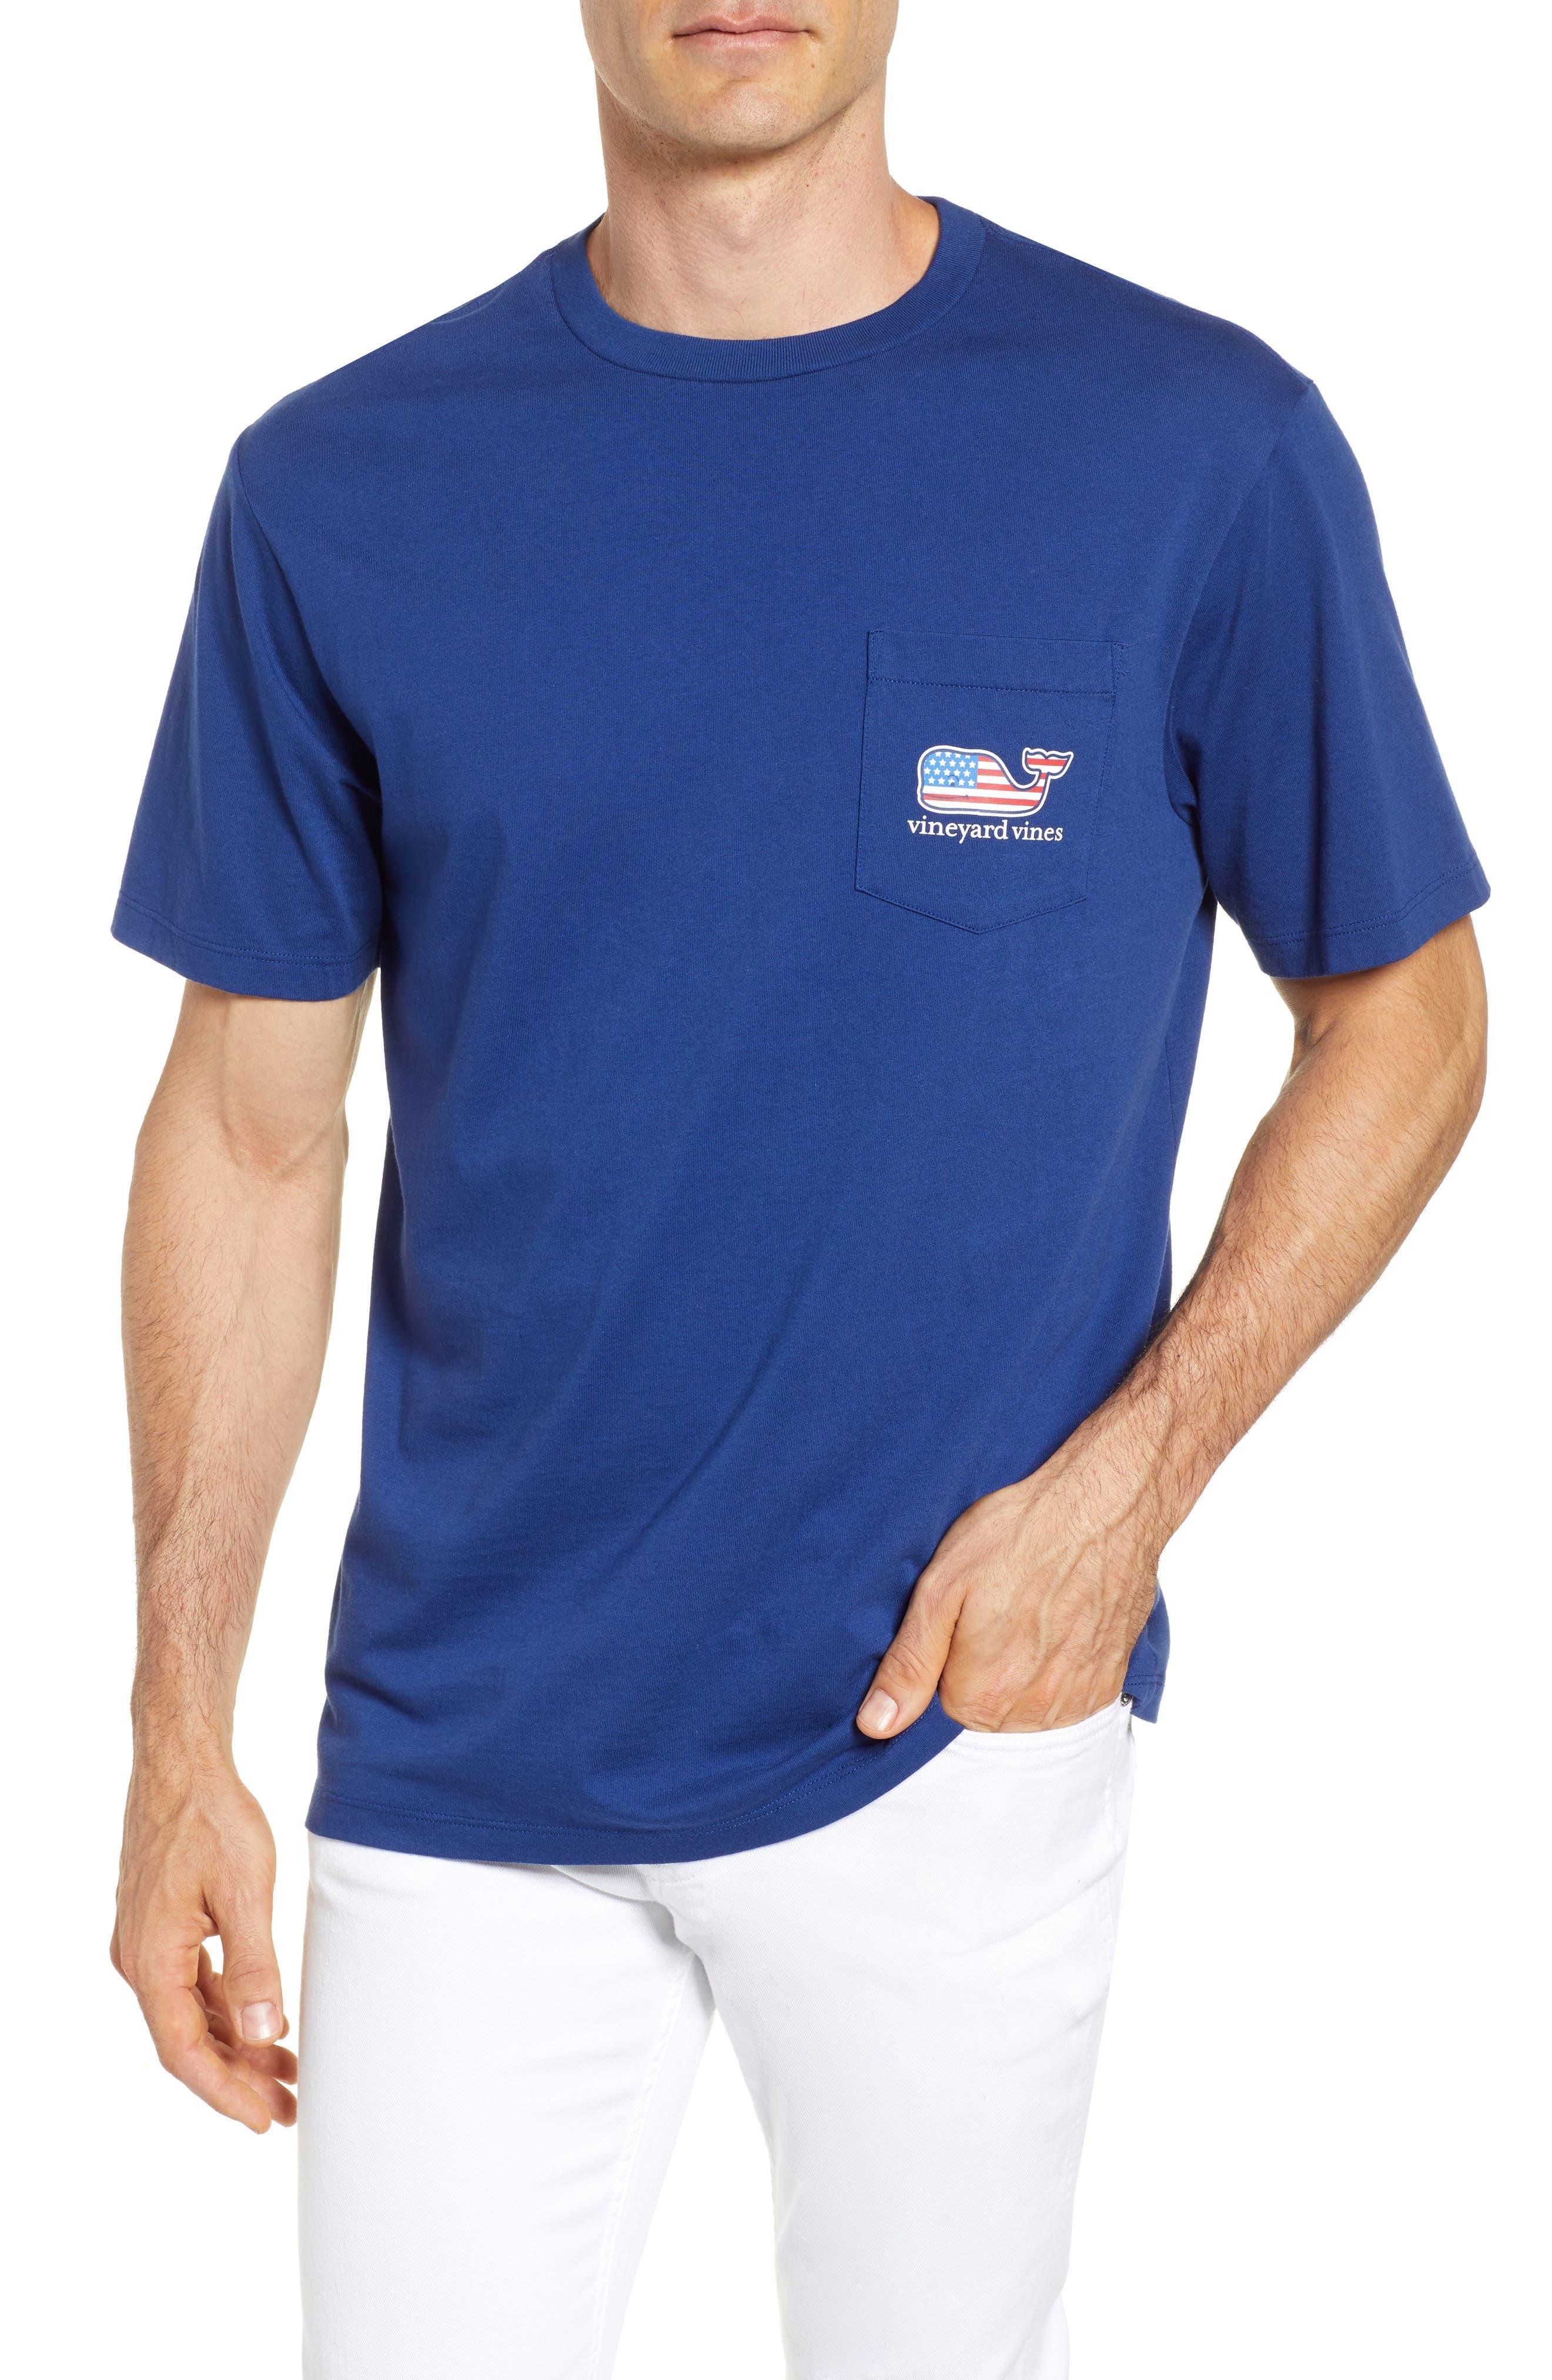 U.S. Tradition Pocket T-Shirt,                         Main,                         color, 400